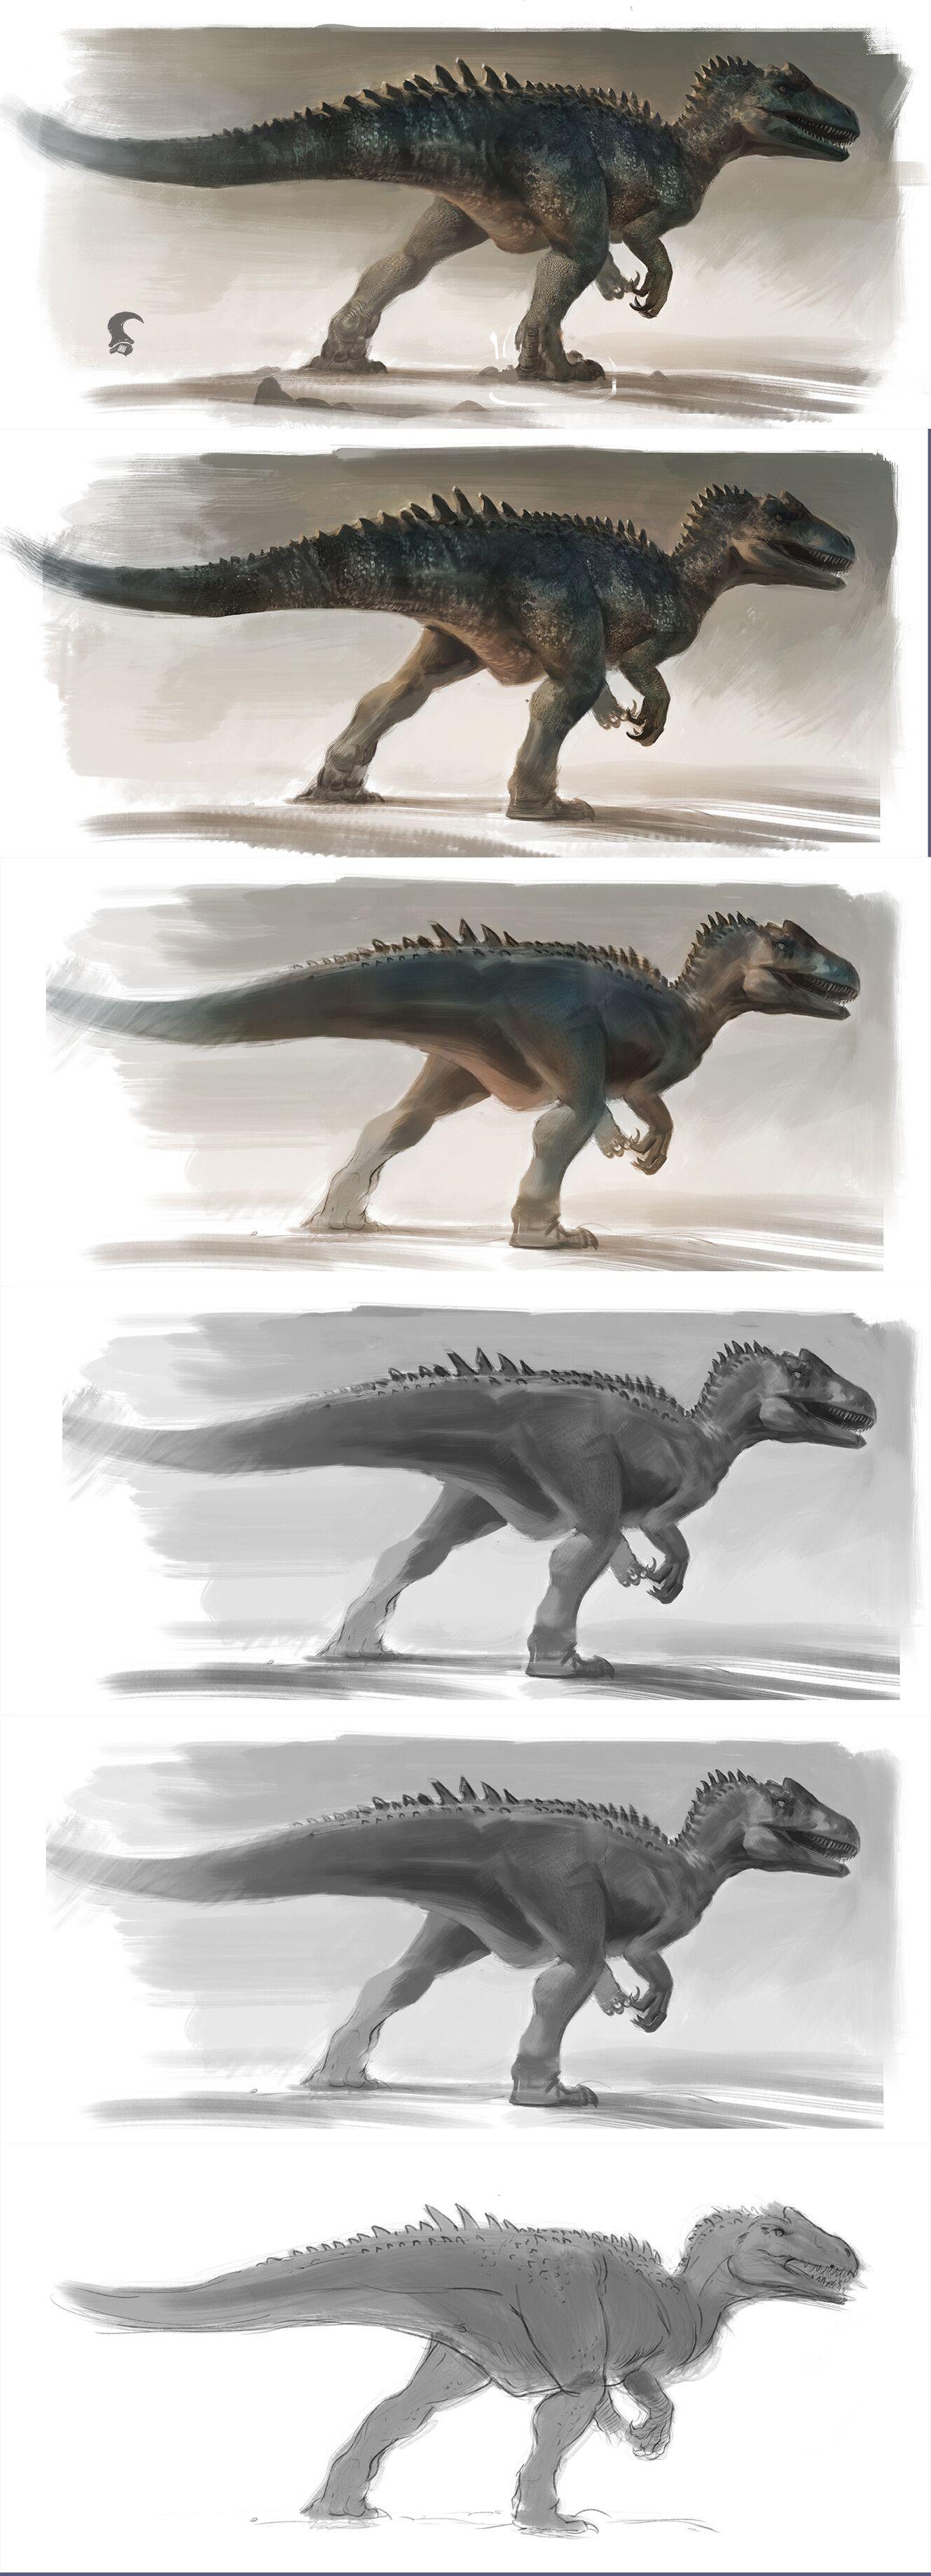 Allosaurus 'Big Rock', Raph Herrera Lomotan